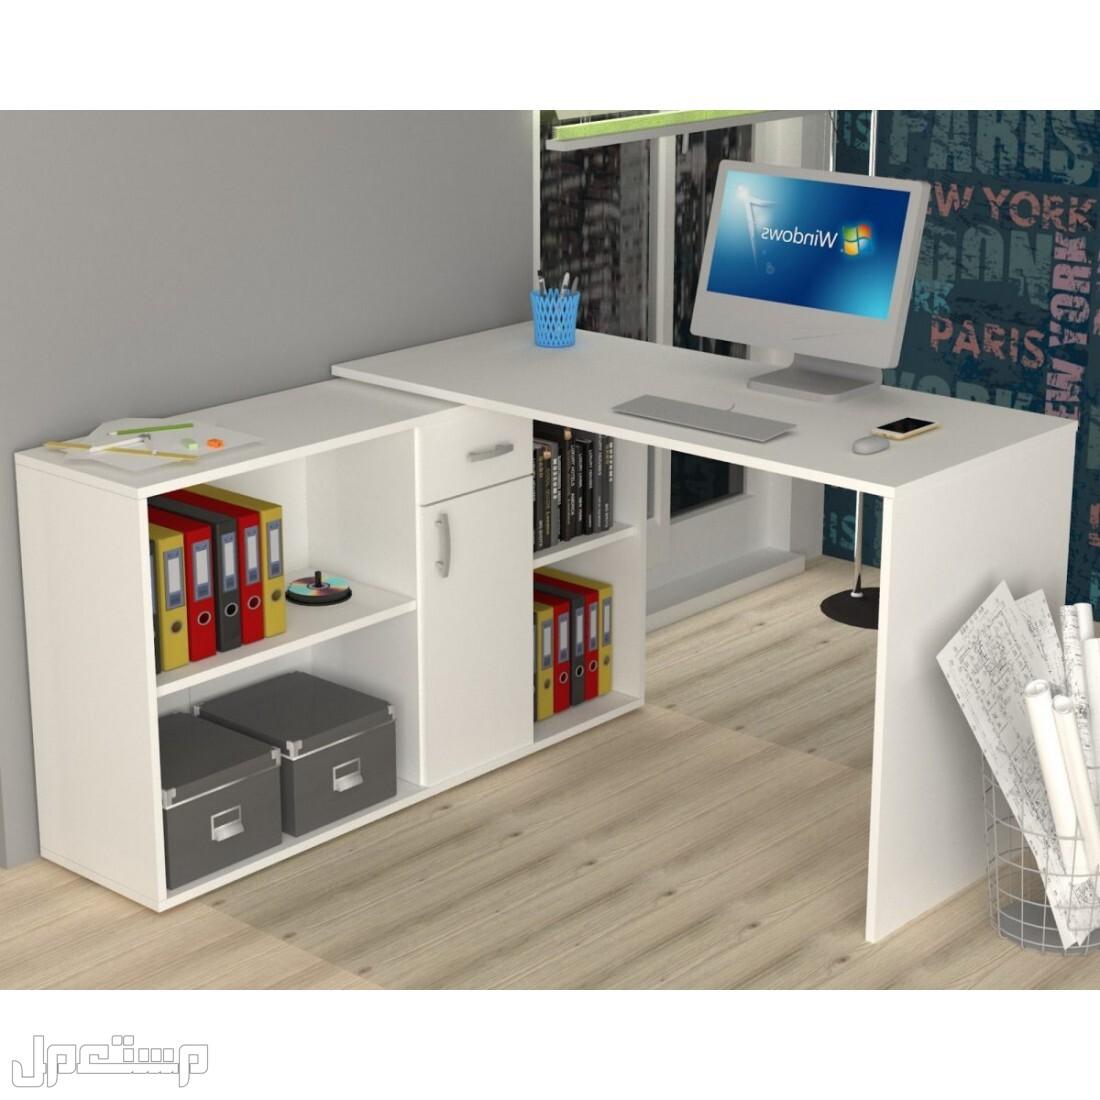 مكتب فخم